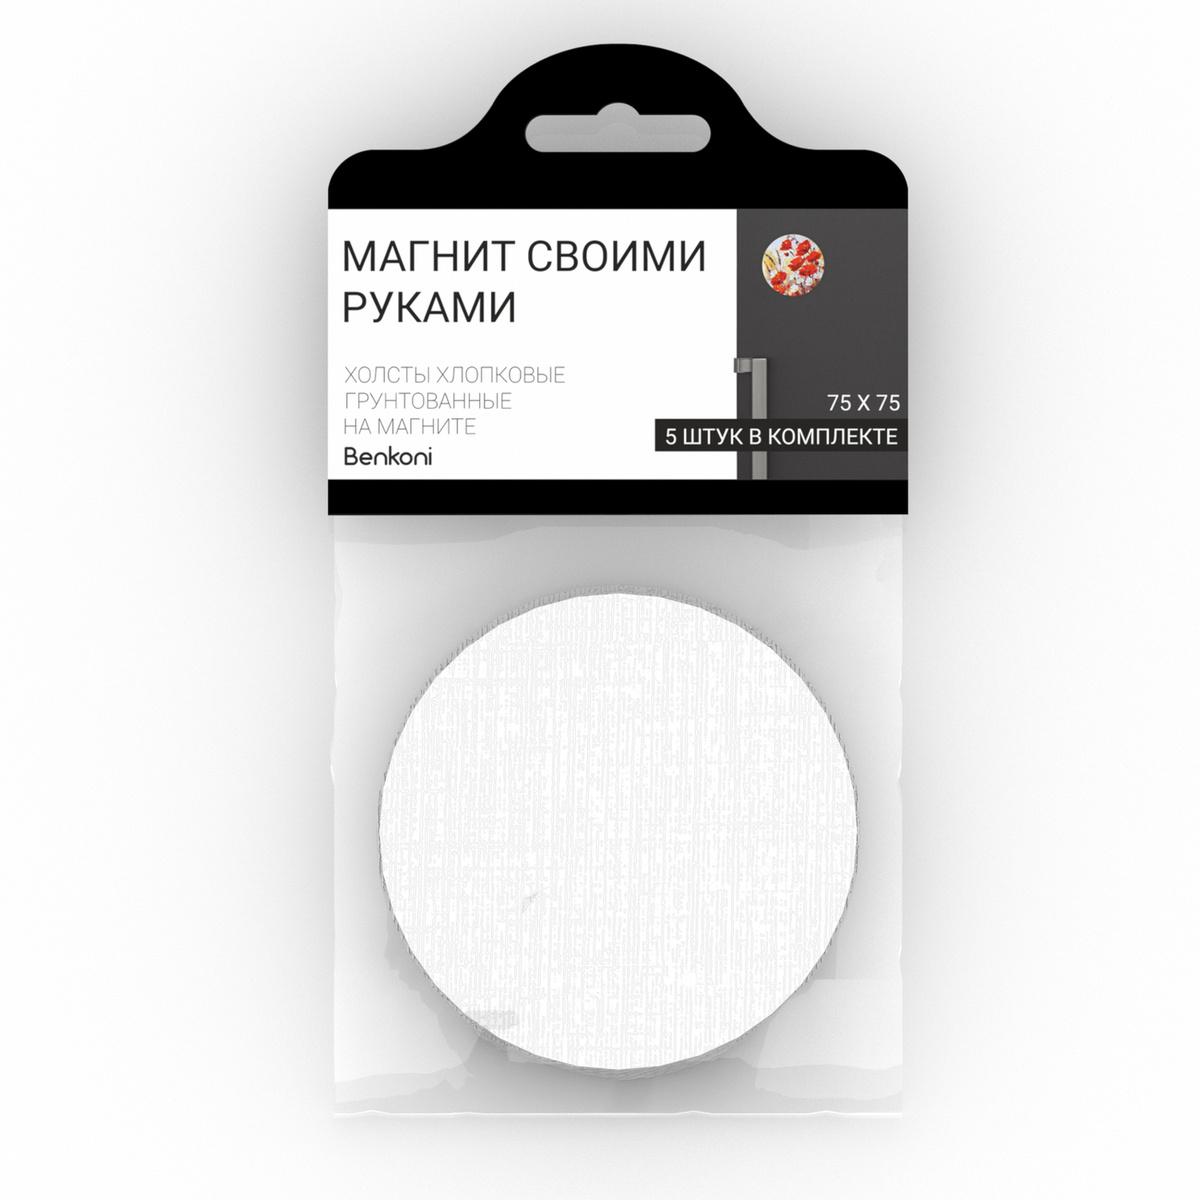 Набор круглых холстов на магните 7,5х7,5 см, 5 шт #1